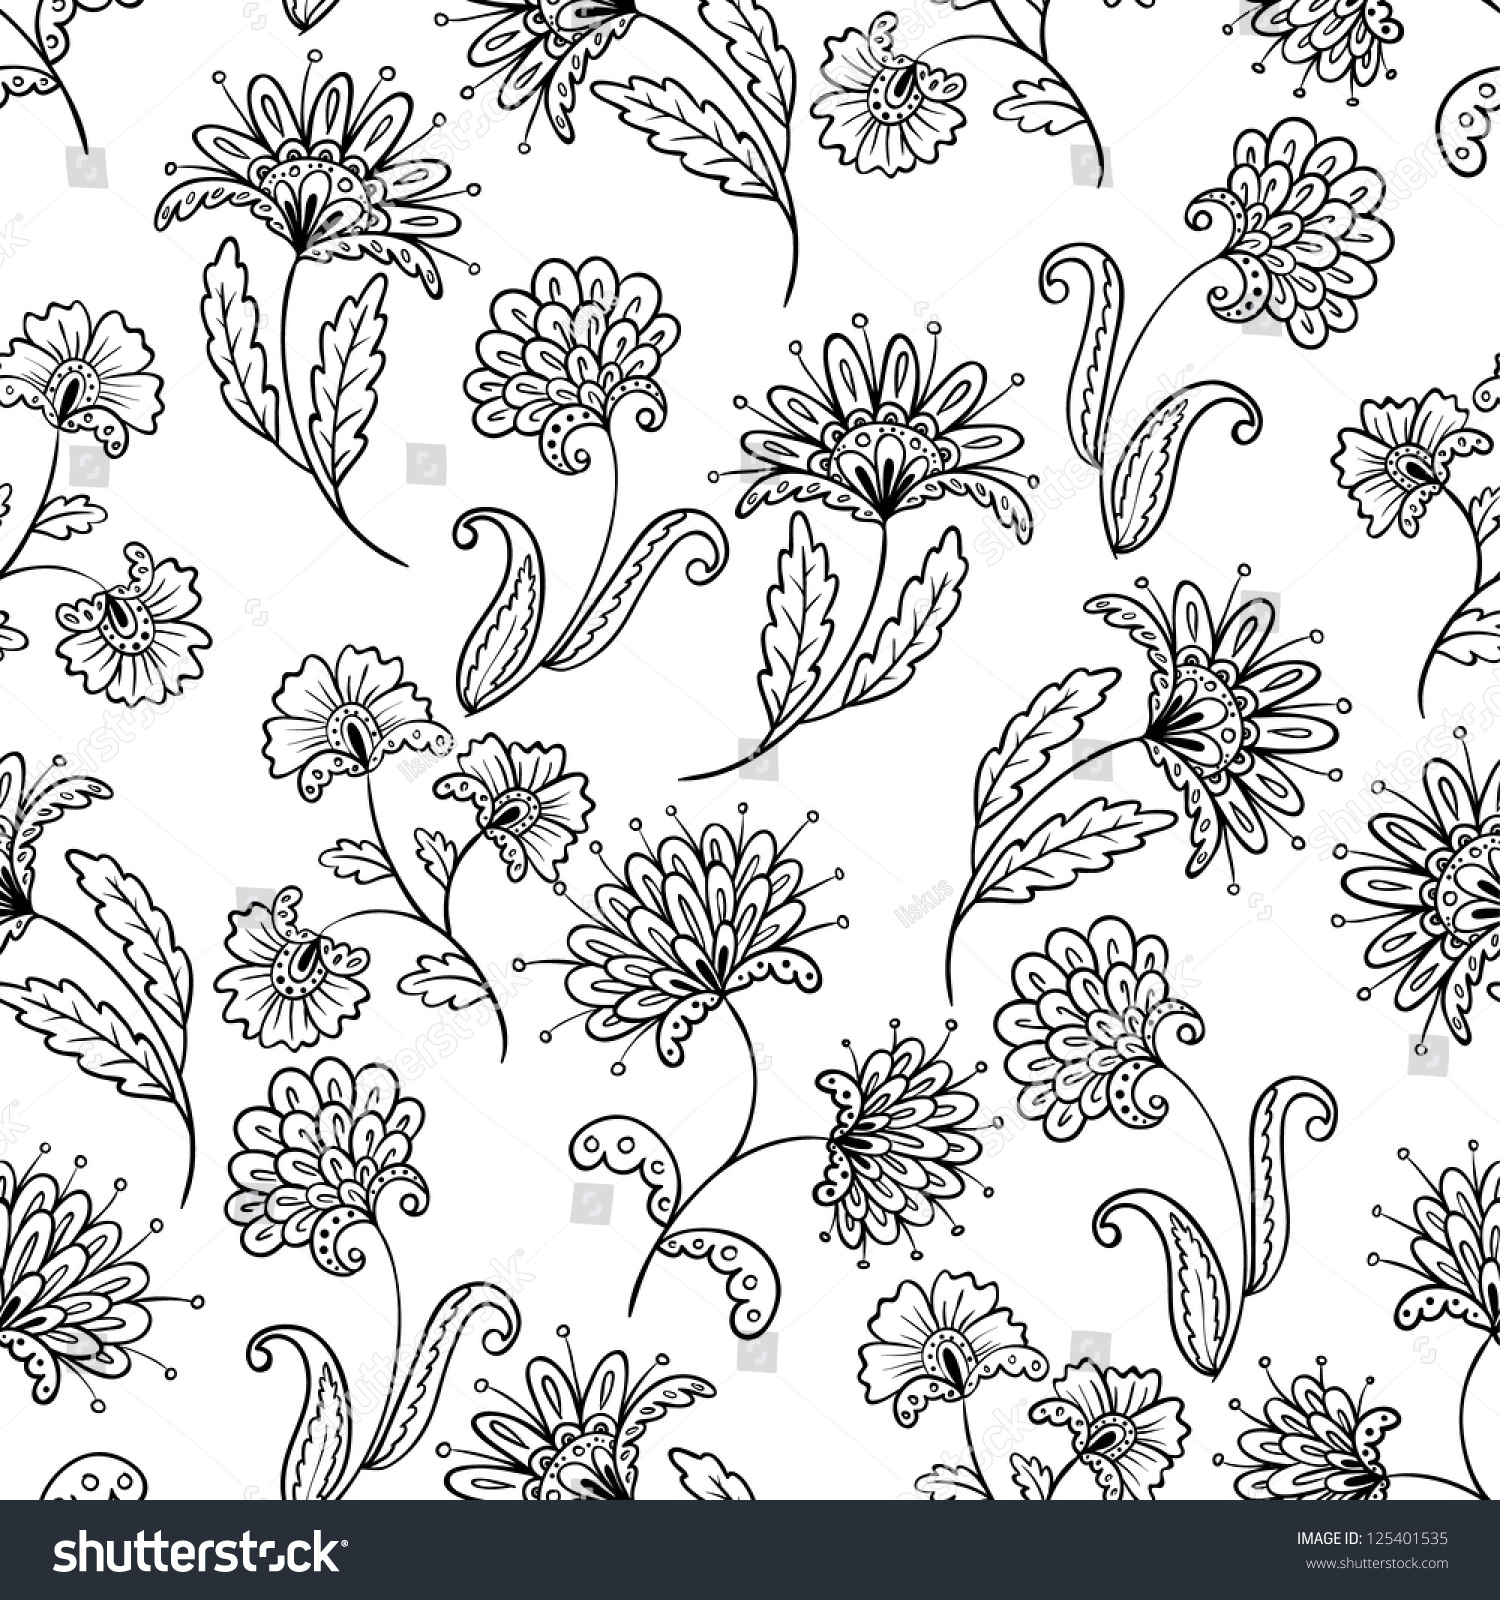 Line Art Flower Pattern : Floral lineart seamless pattern stock vector